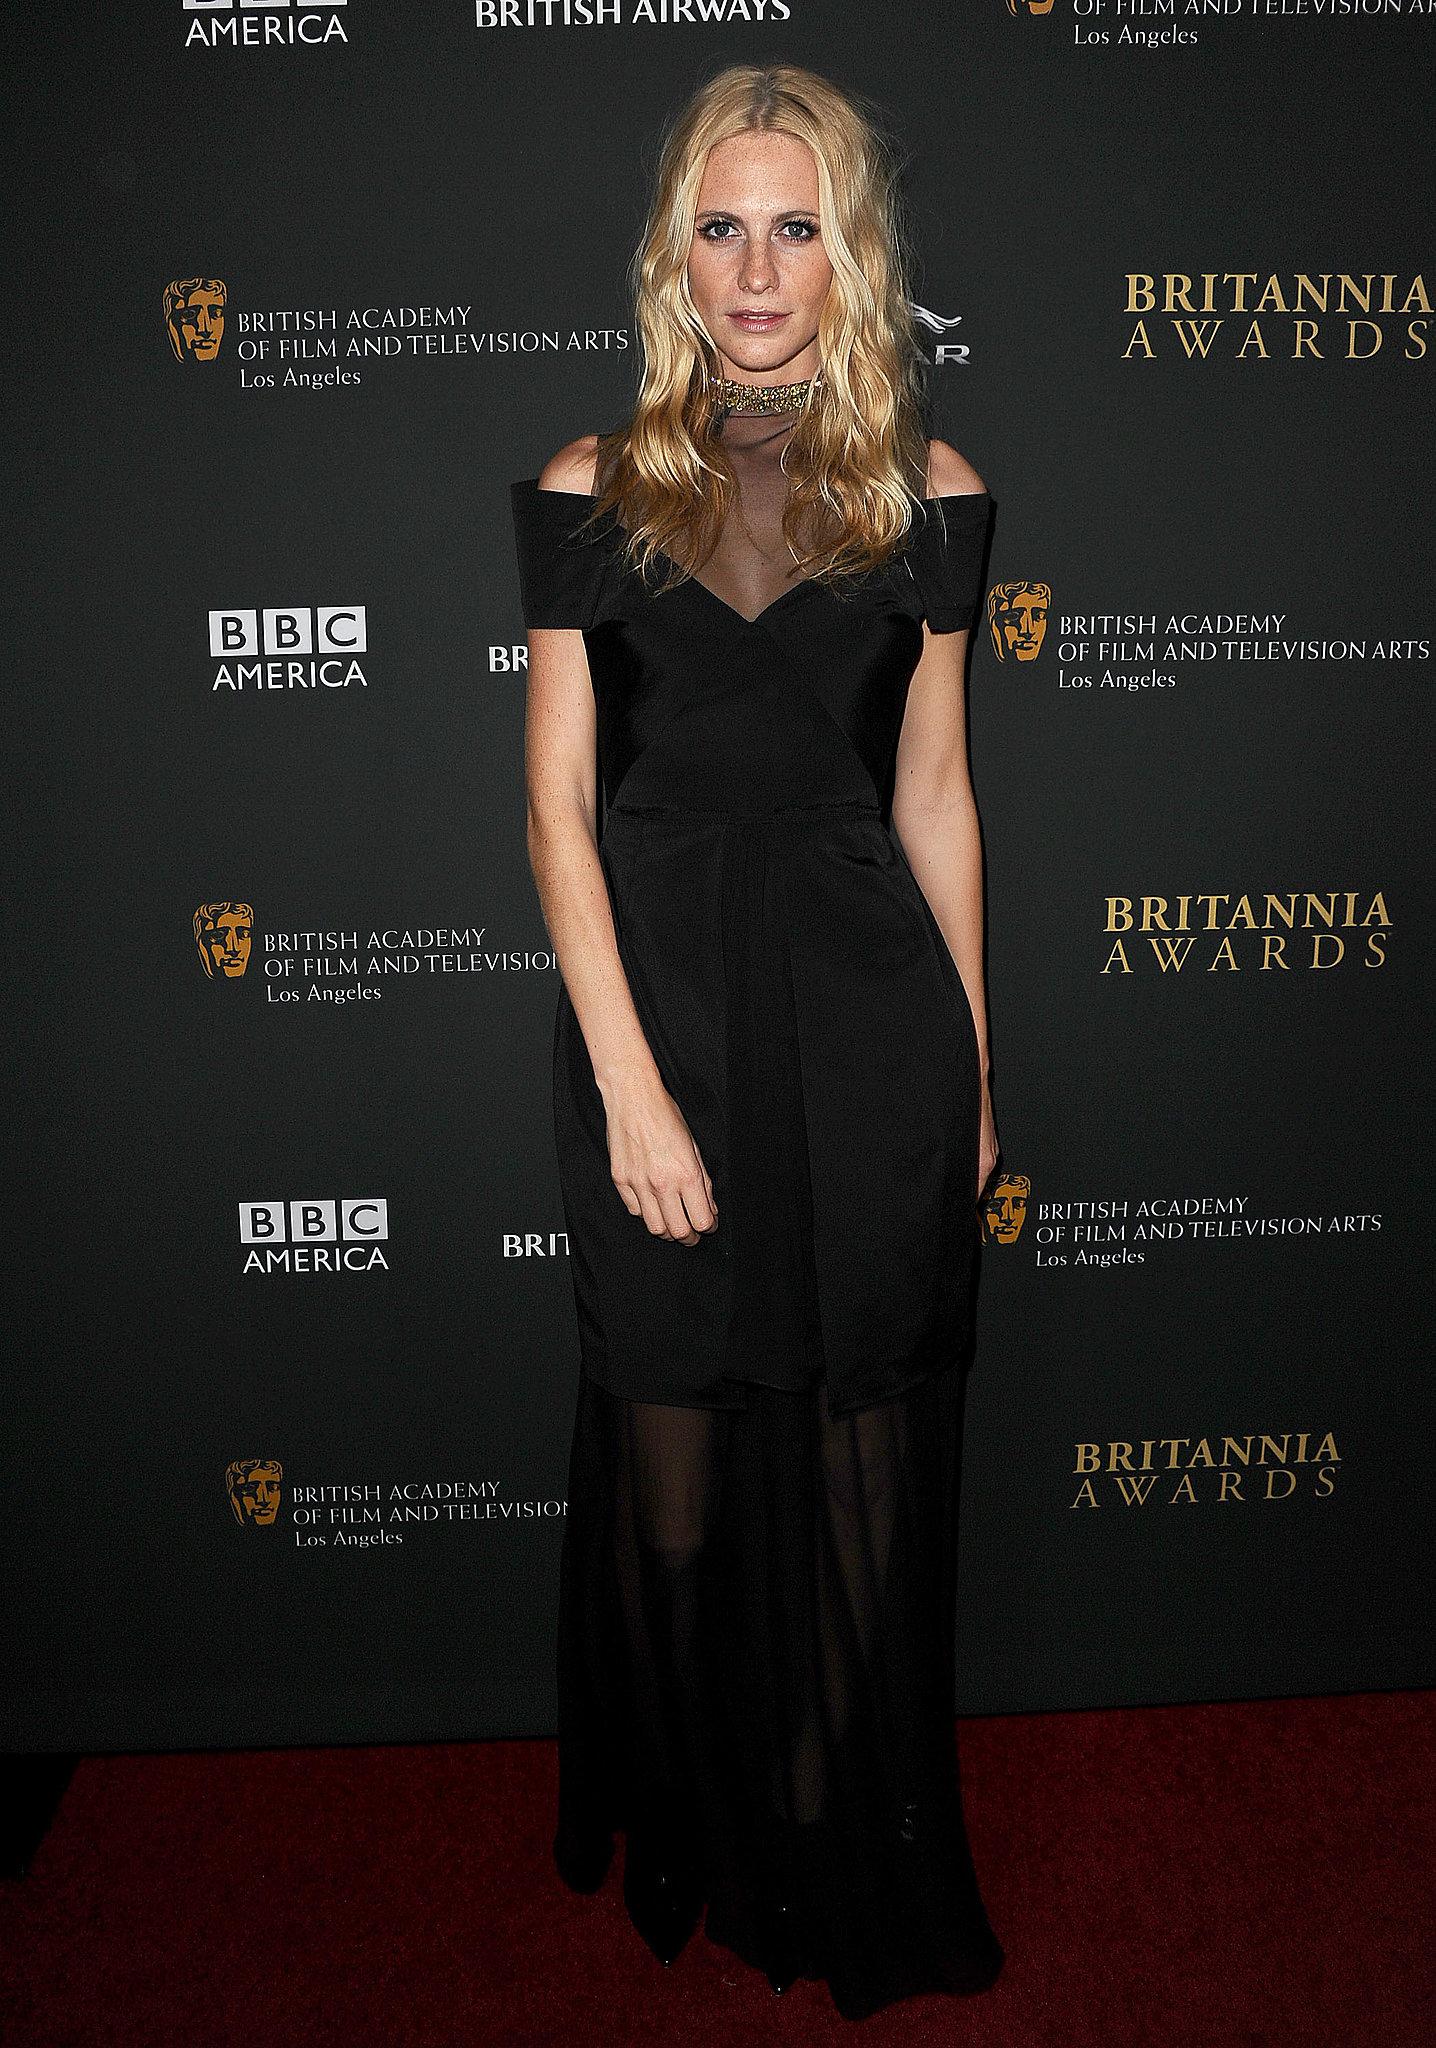 Poppy Delevingne in Marios Schwab at the BAFTA Britannia Award